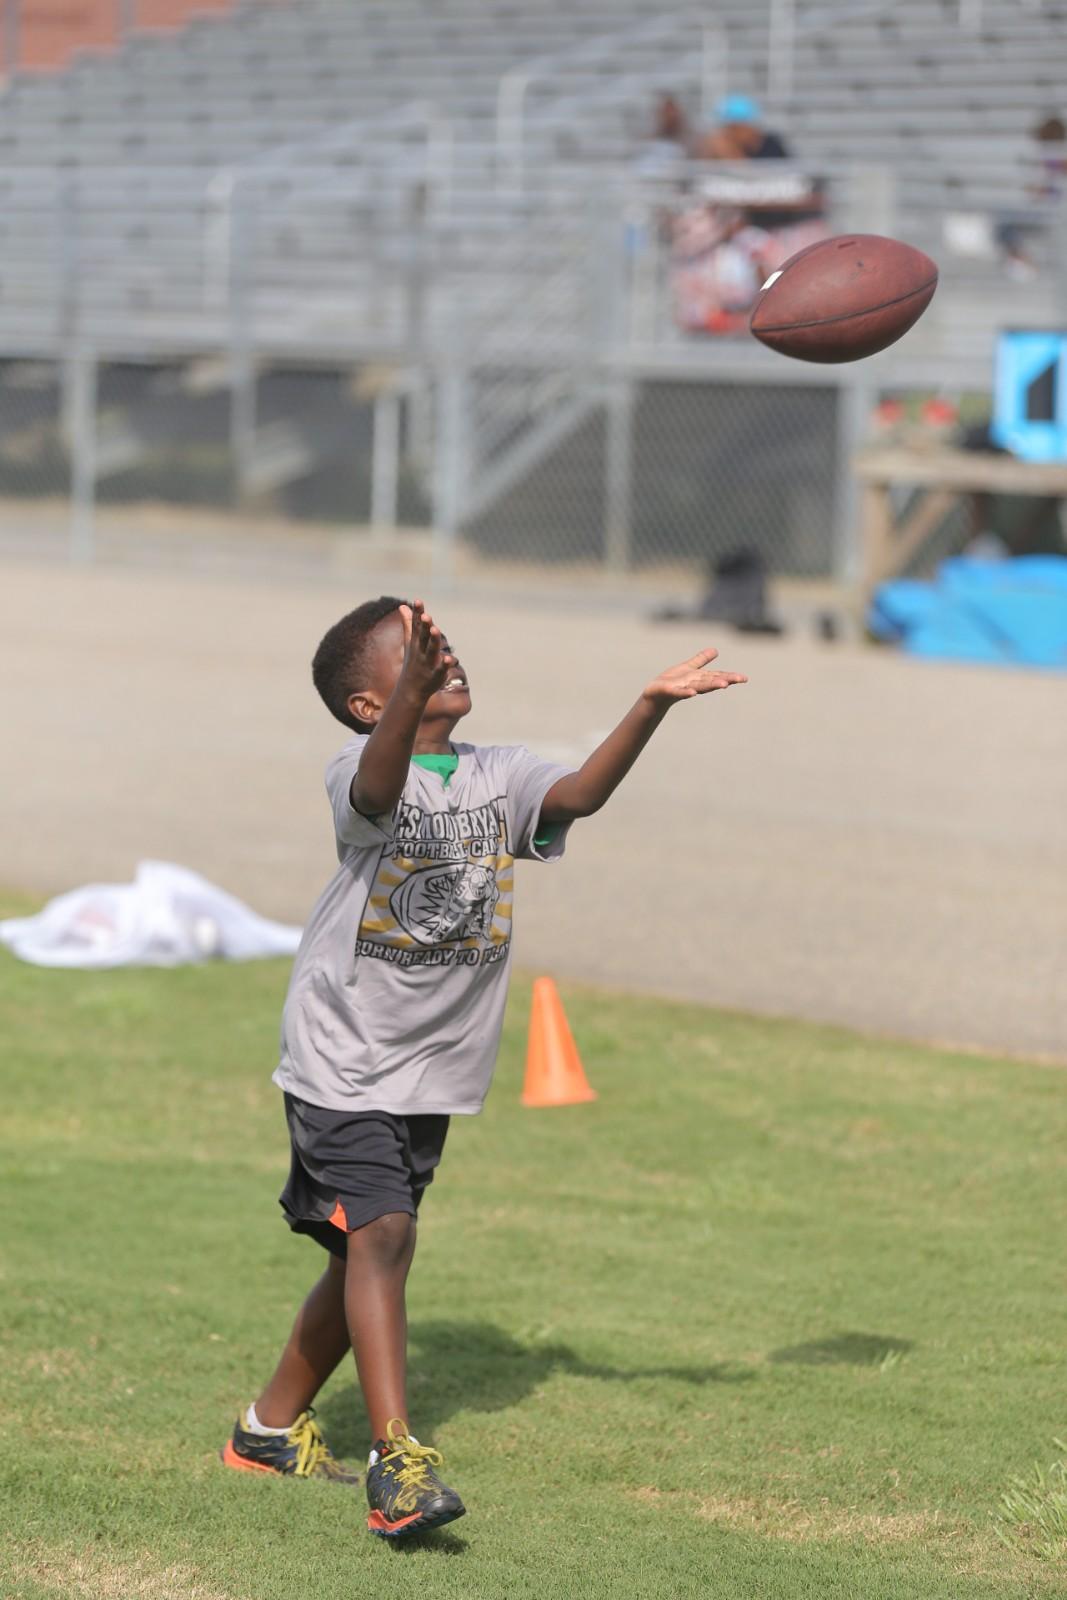 Desmond Bryant 7th annual football camp